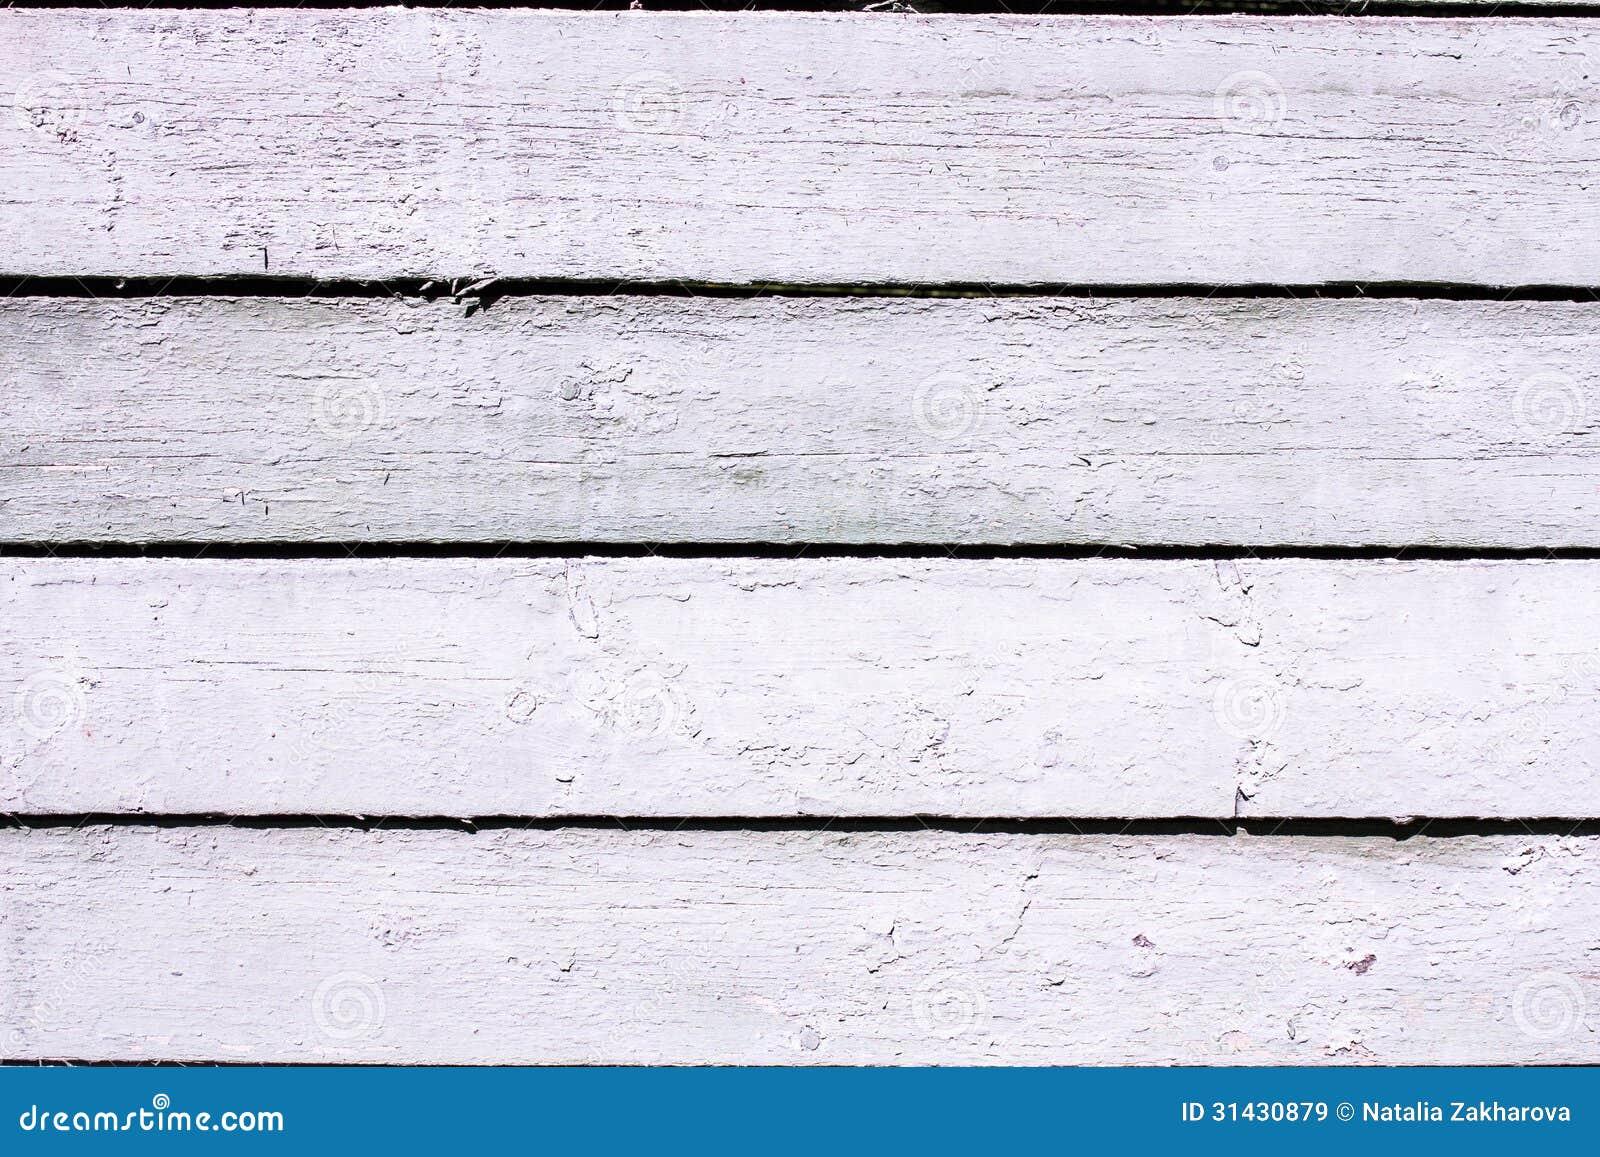 weathered wood panel wallpaper